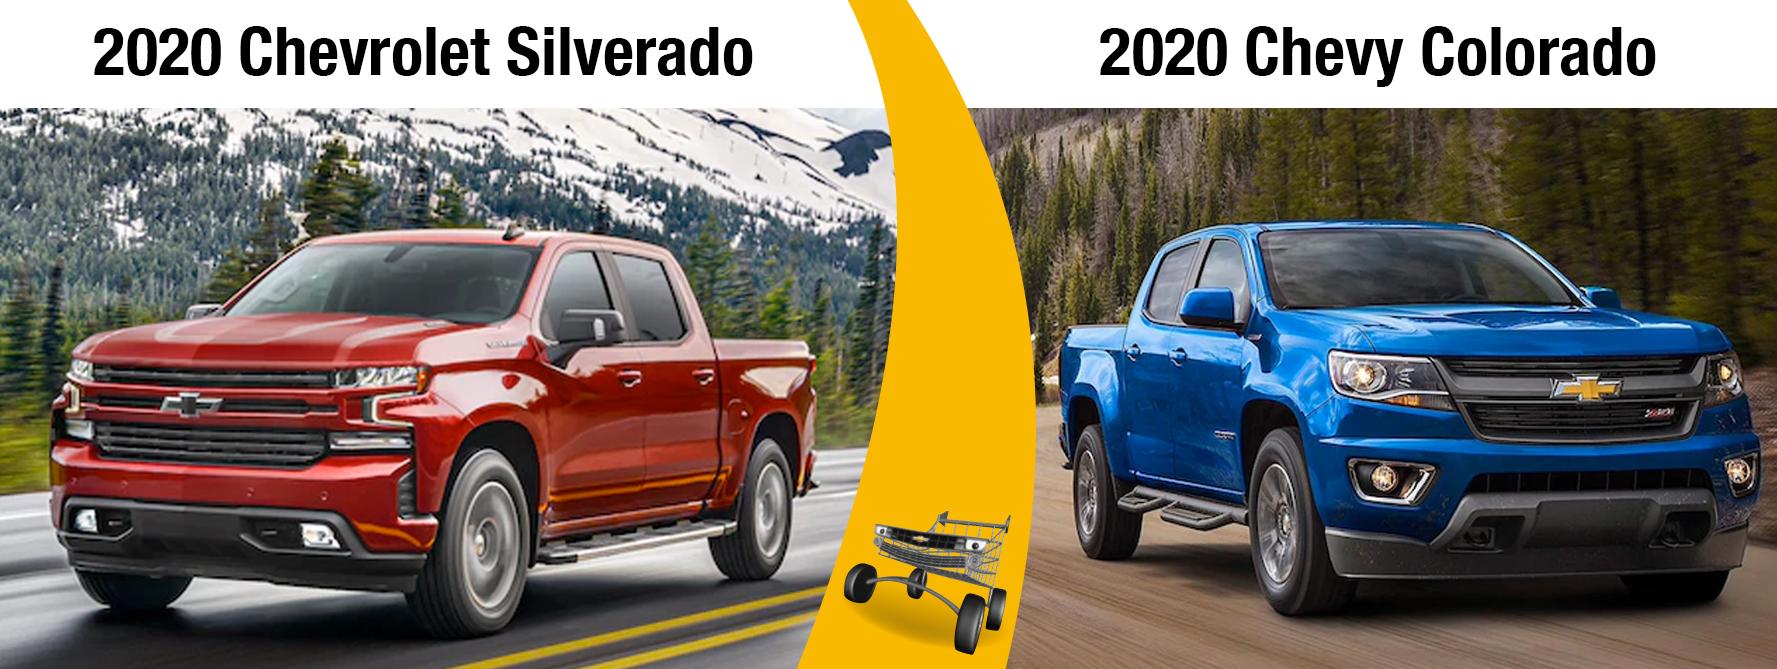 2020 Chevy Silverado vs 2020 Chevy Colorado